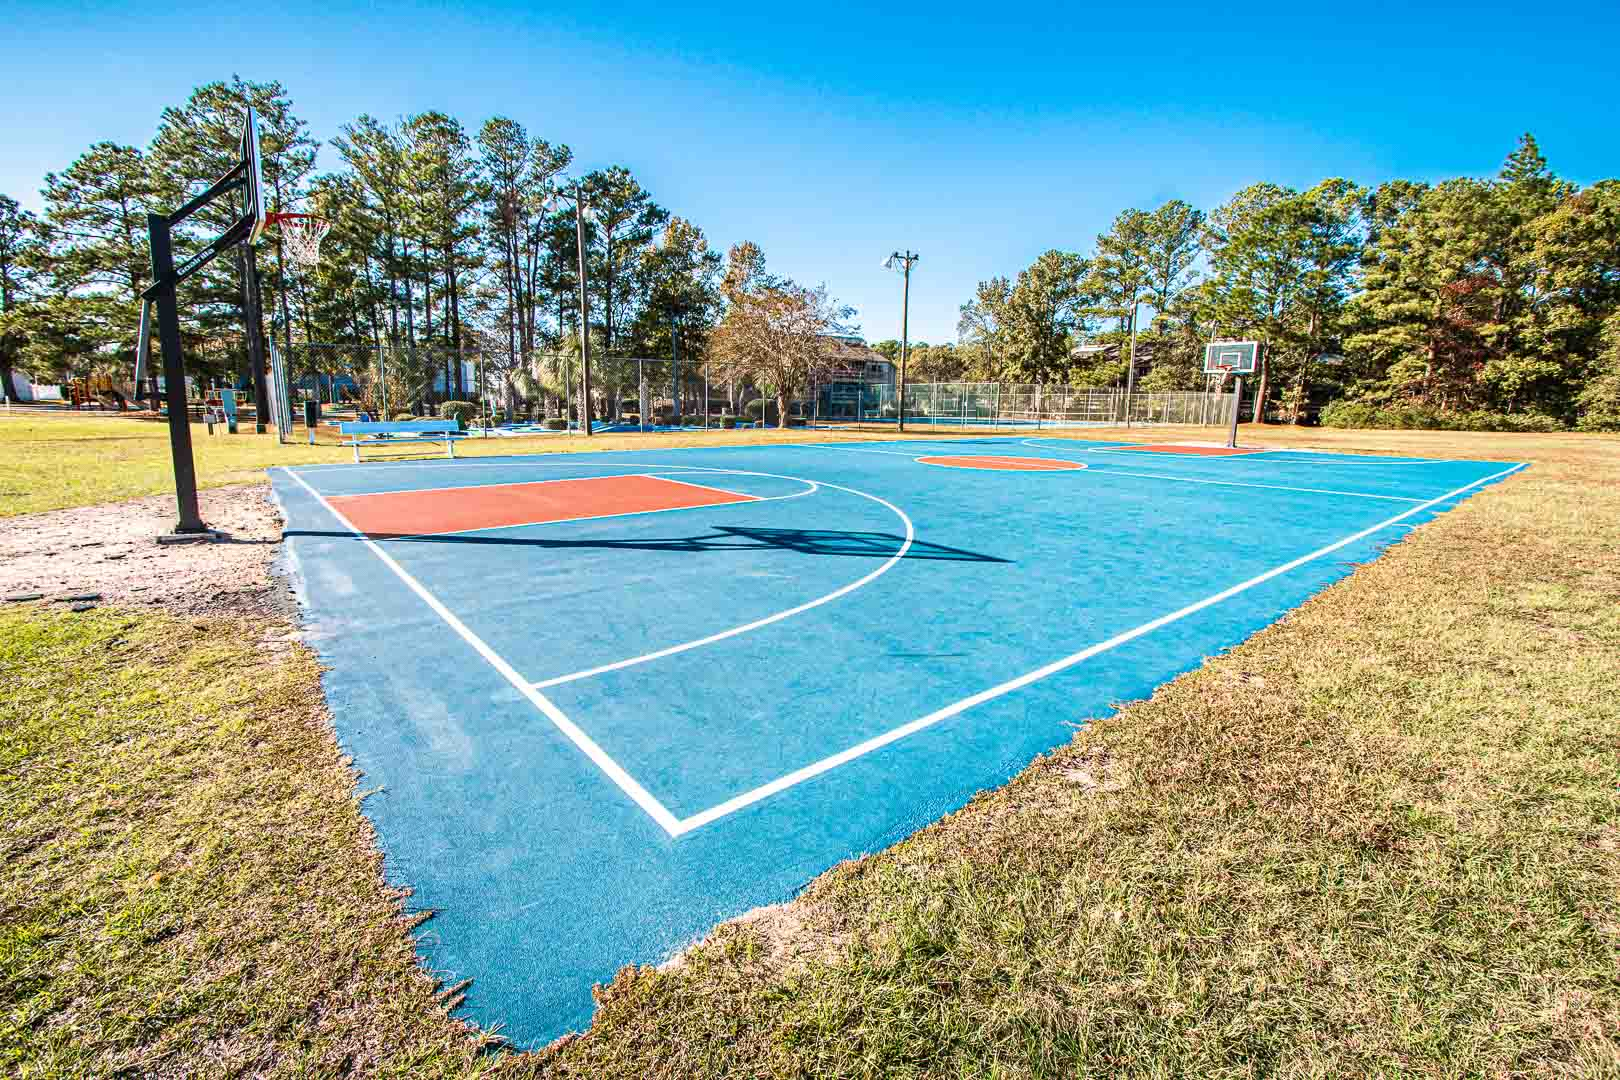 full size outdoor basketball court  at VRI's Sandcastle Village in New Bern, North Carolina.